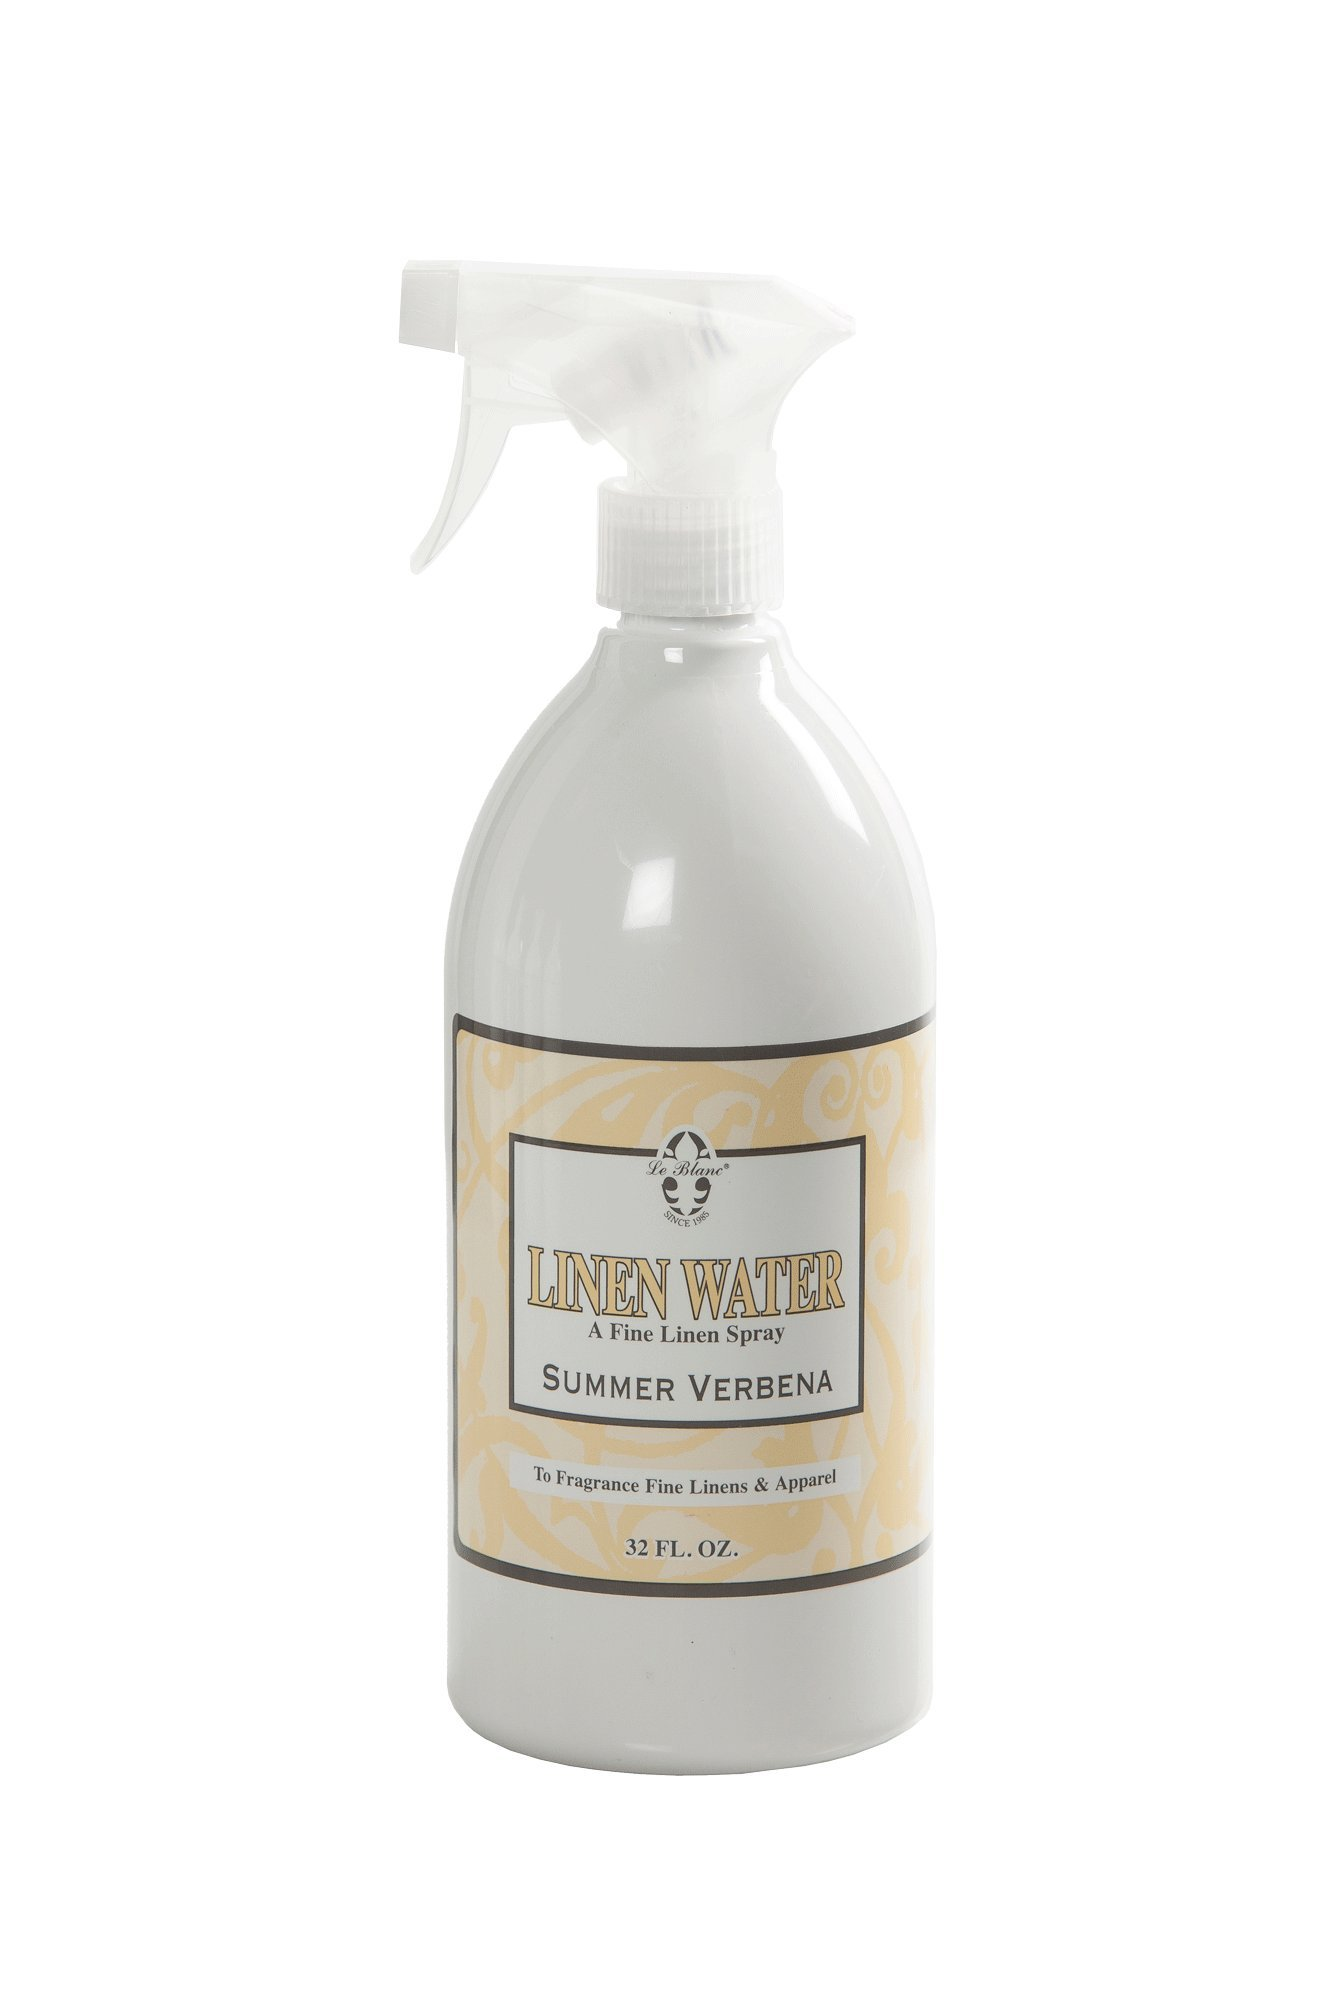 Le Blanc® Summer Verbena Linen Water - 32 FL. OZ, 2 Pack by LE BLANC